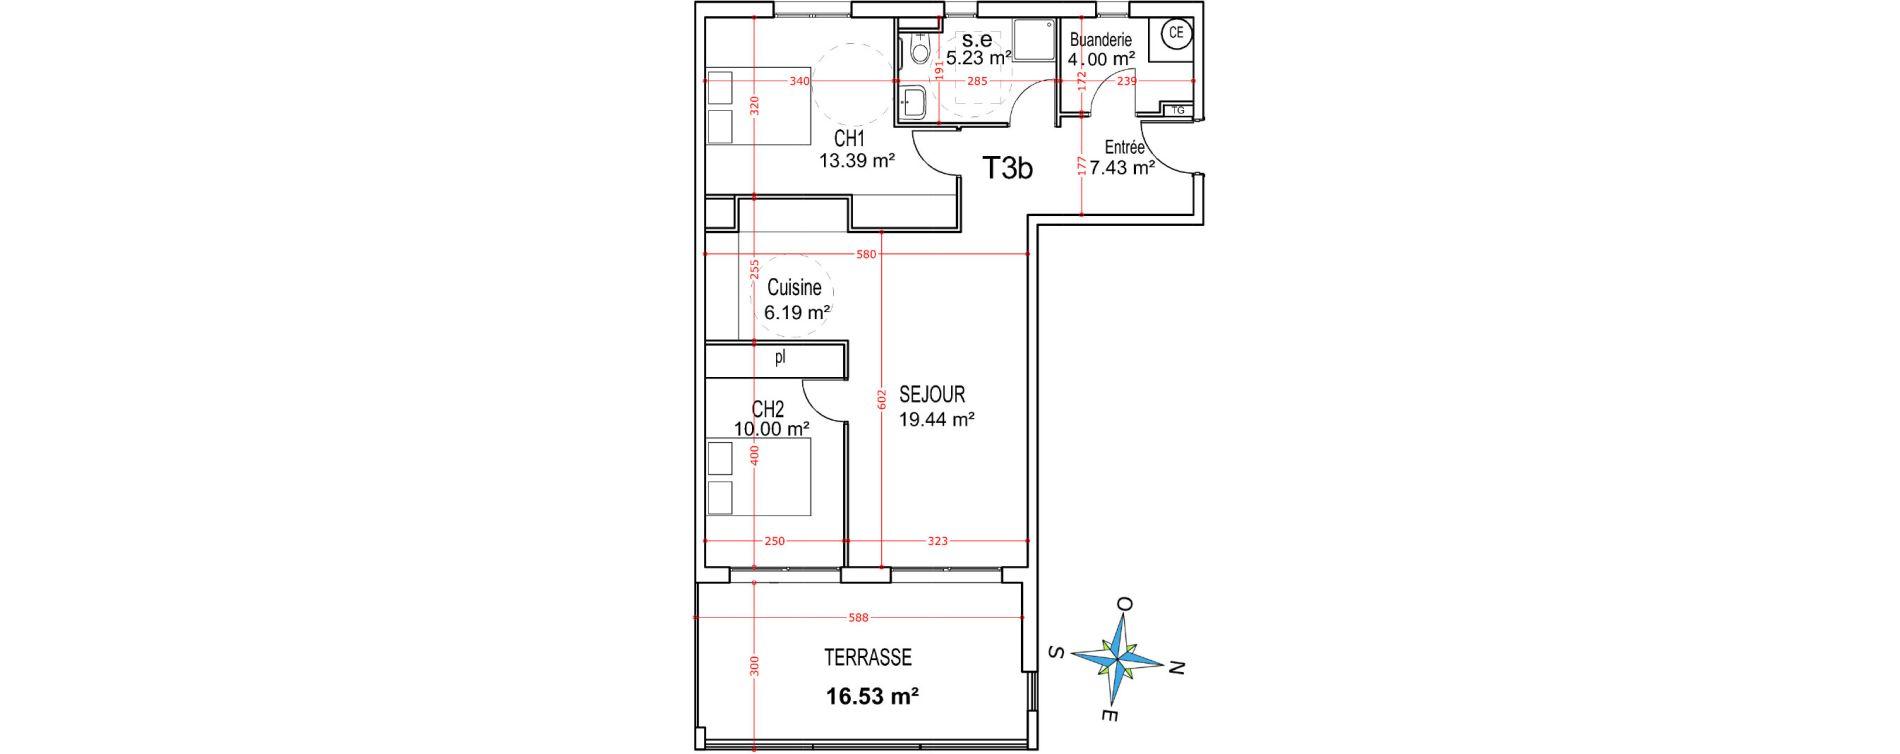 Appartement T3 de 65,68 m2 à Castellare-Di-Casinca Centre